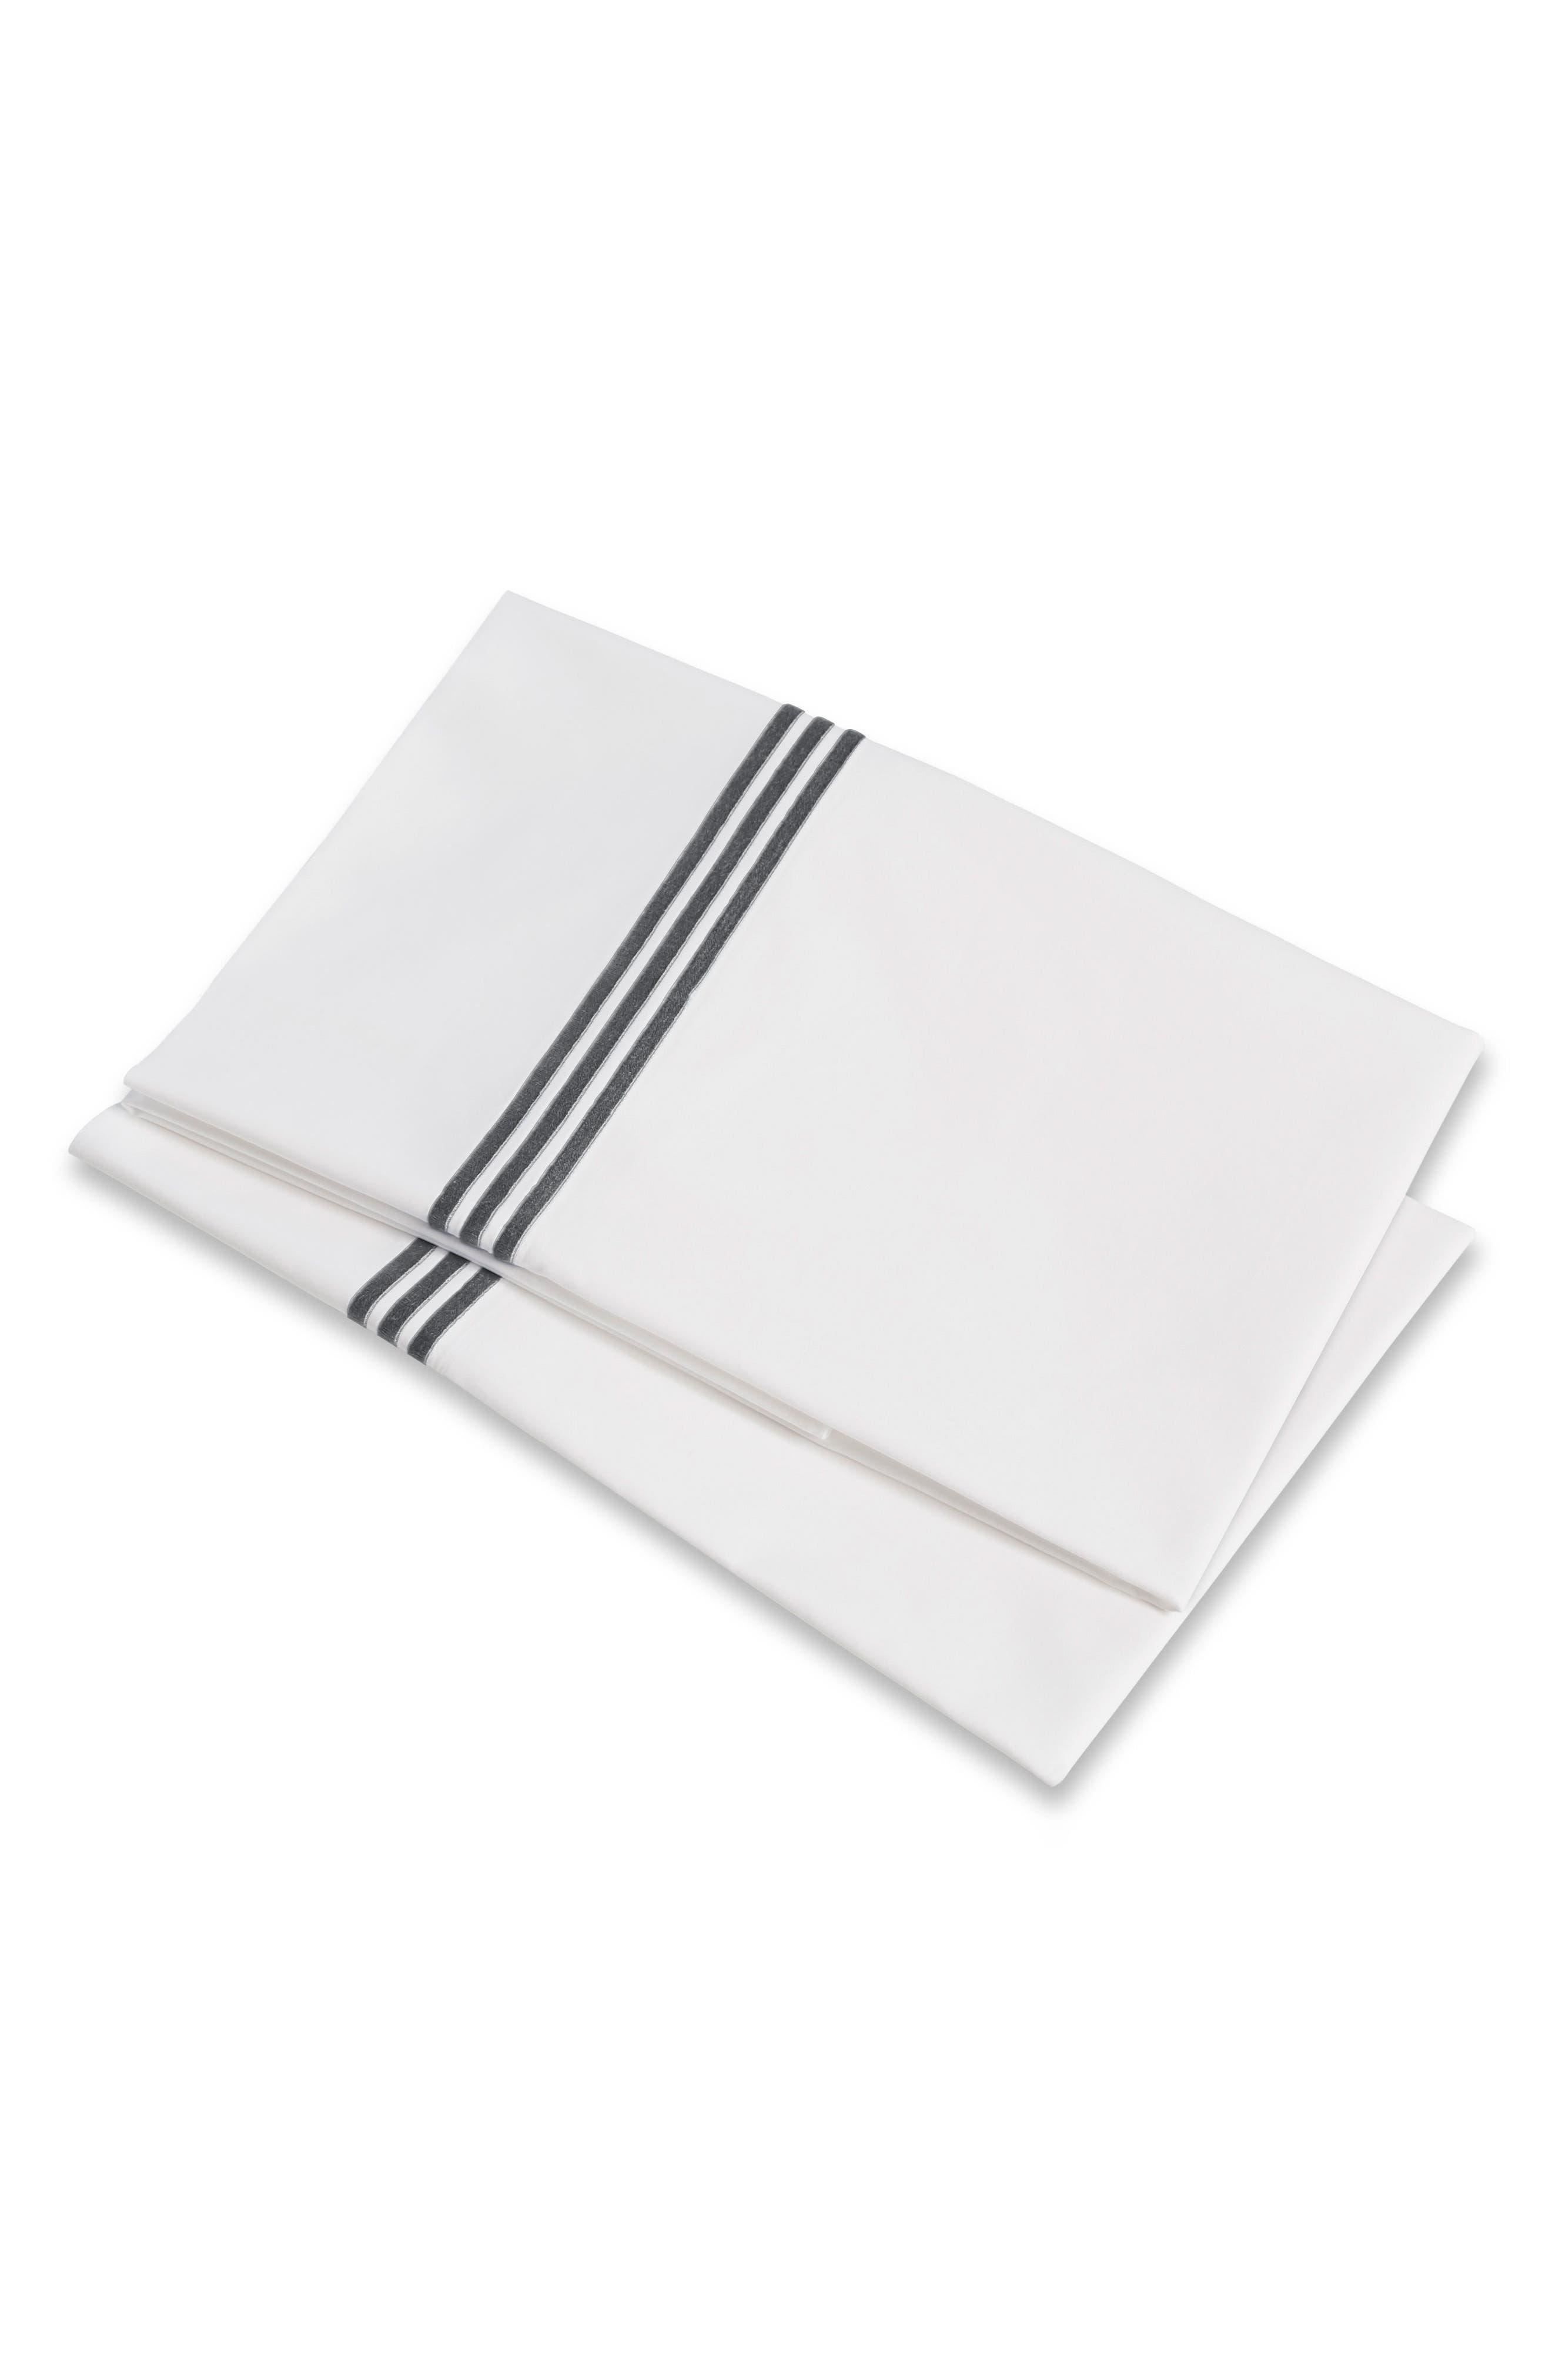 Platinum 400 Thread Count Set of 2 Pillowcases,                             Main thumbnail 1, color,                             LEAD GREY